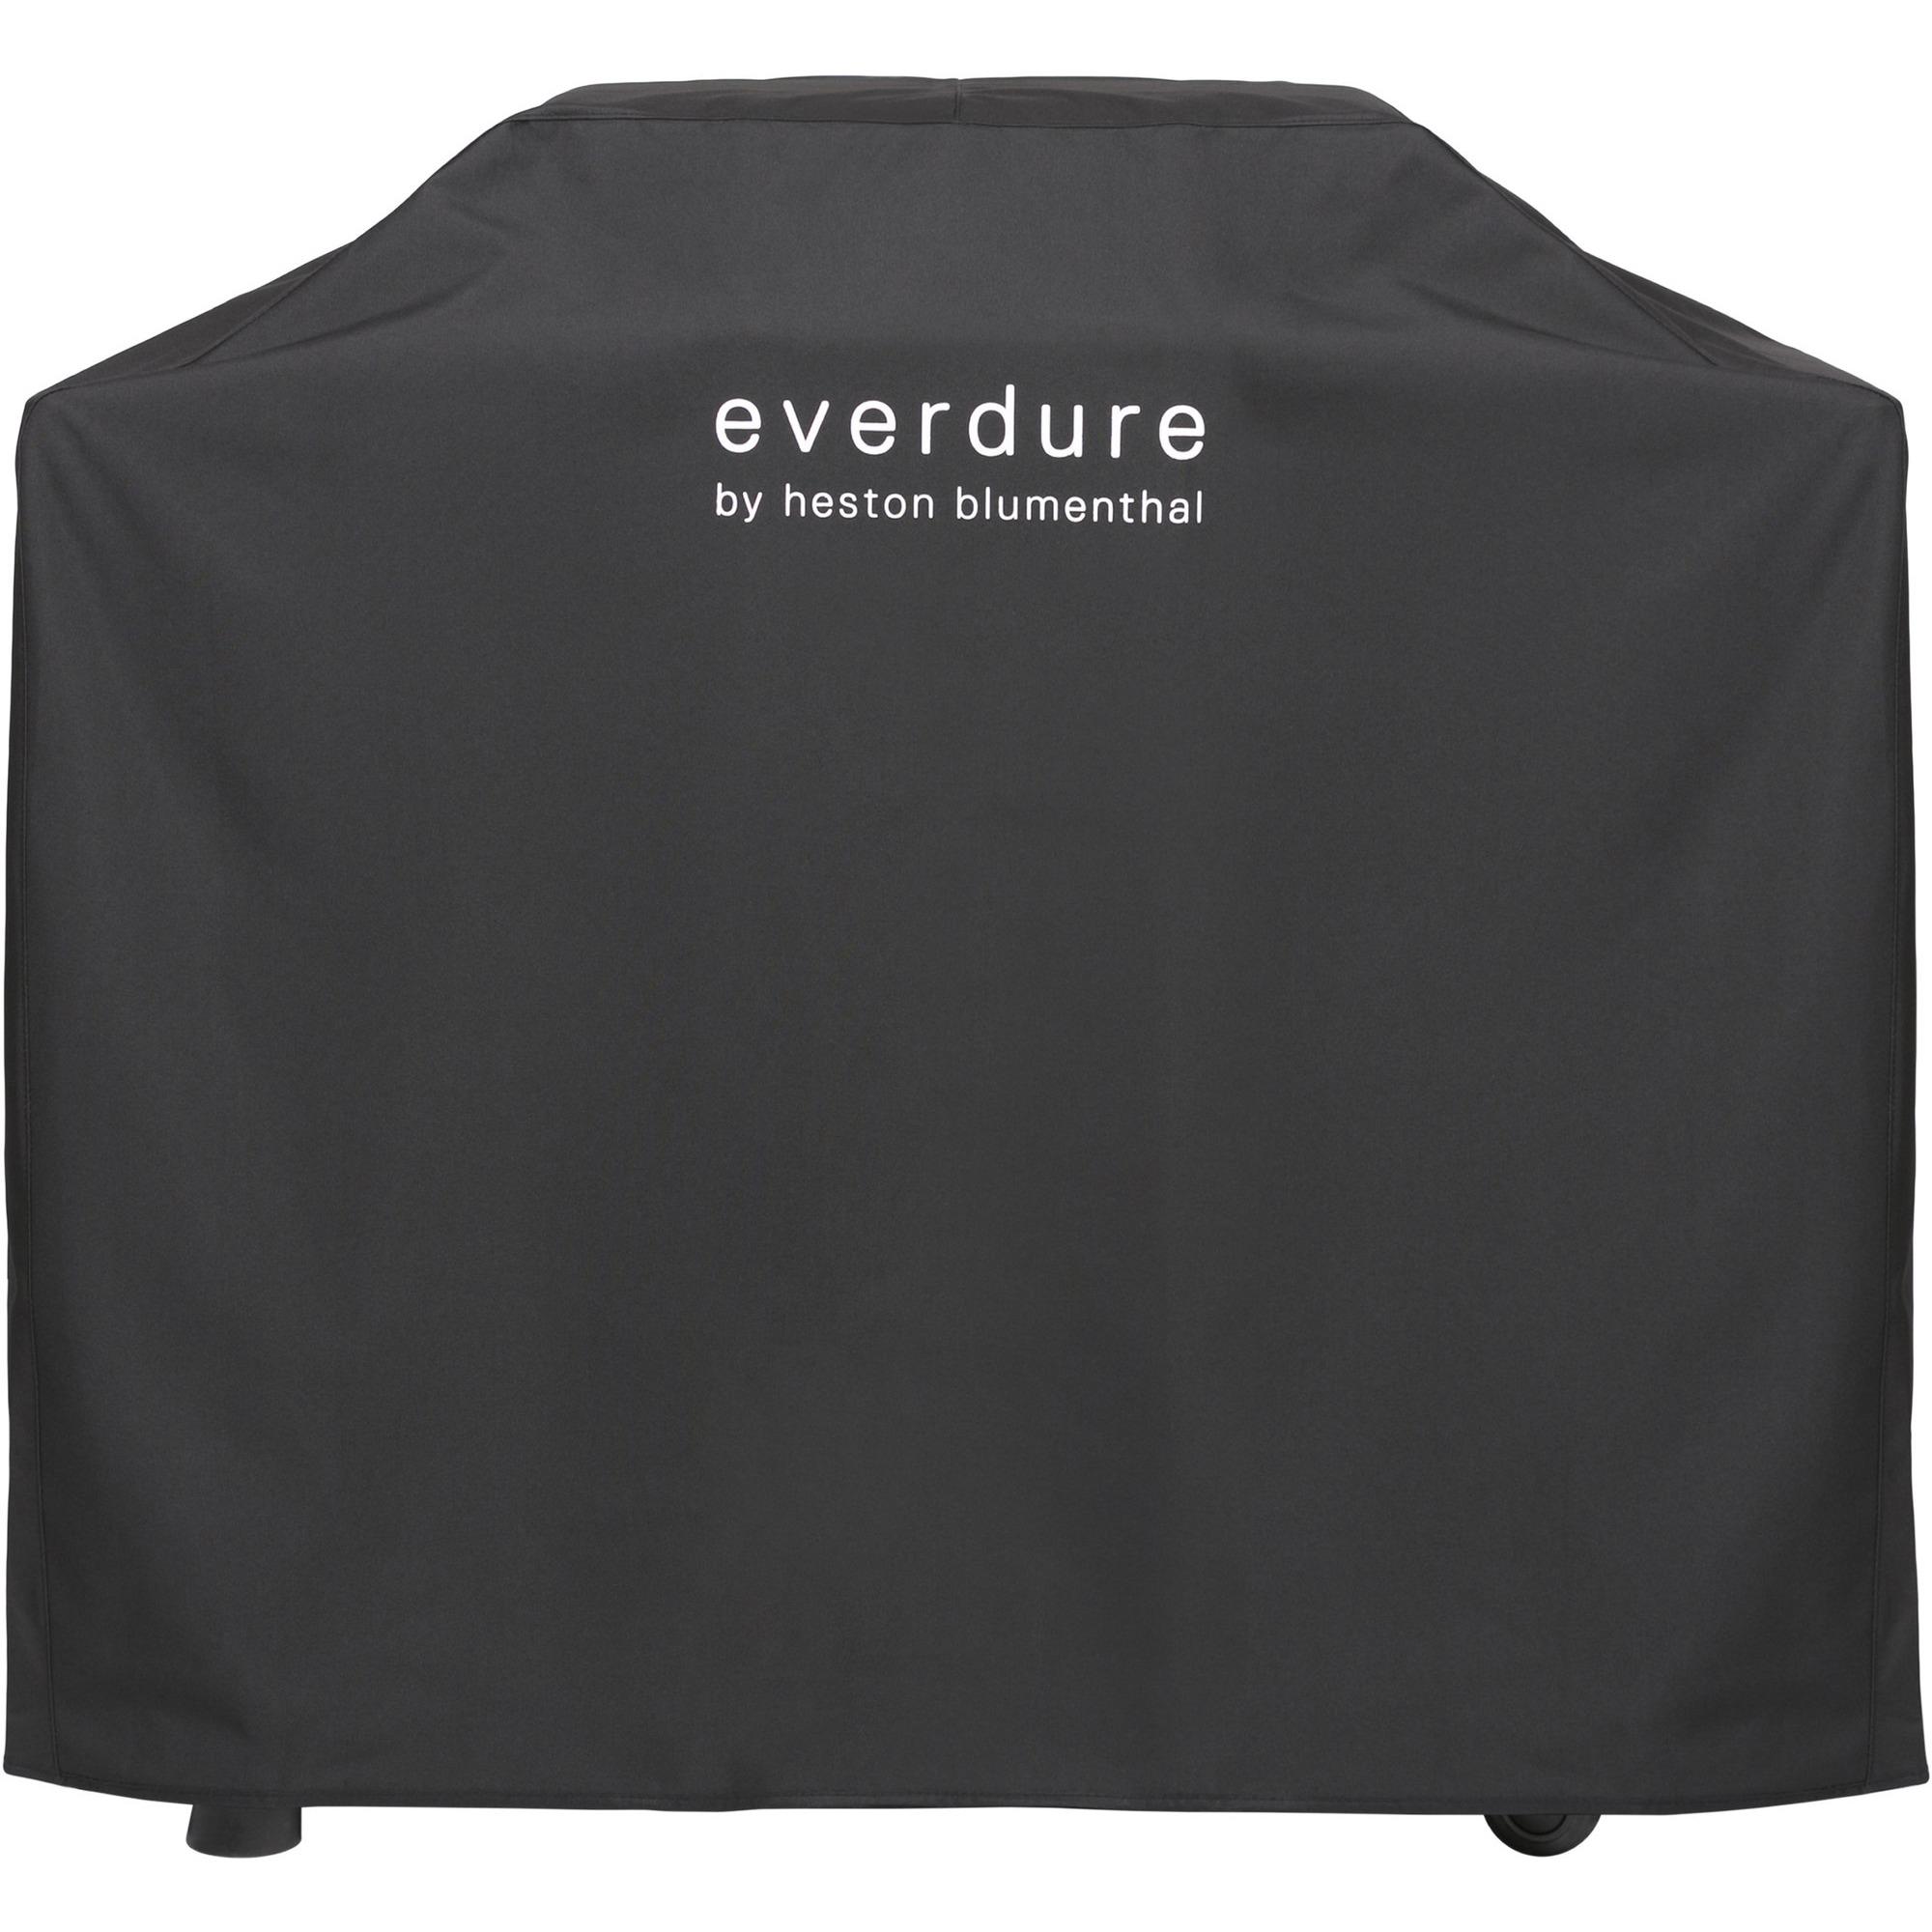 Everdure Force grillöverdrag